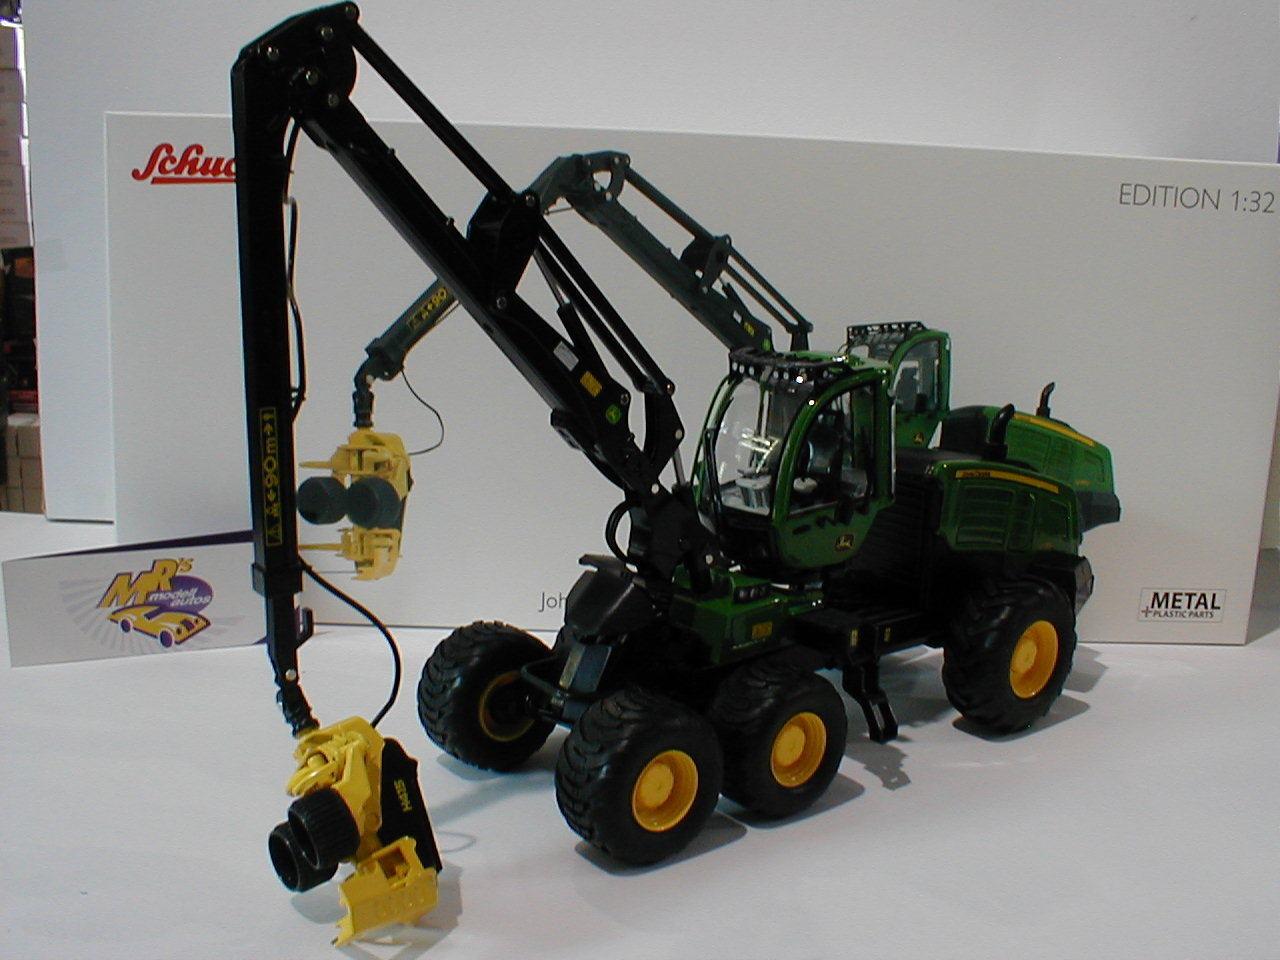 Schuco 07759 - Traktor John Deere 1270G 6W Harvester in   grün   1 32 NEUHEIT